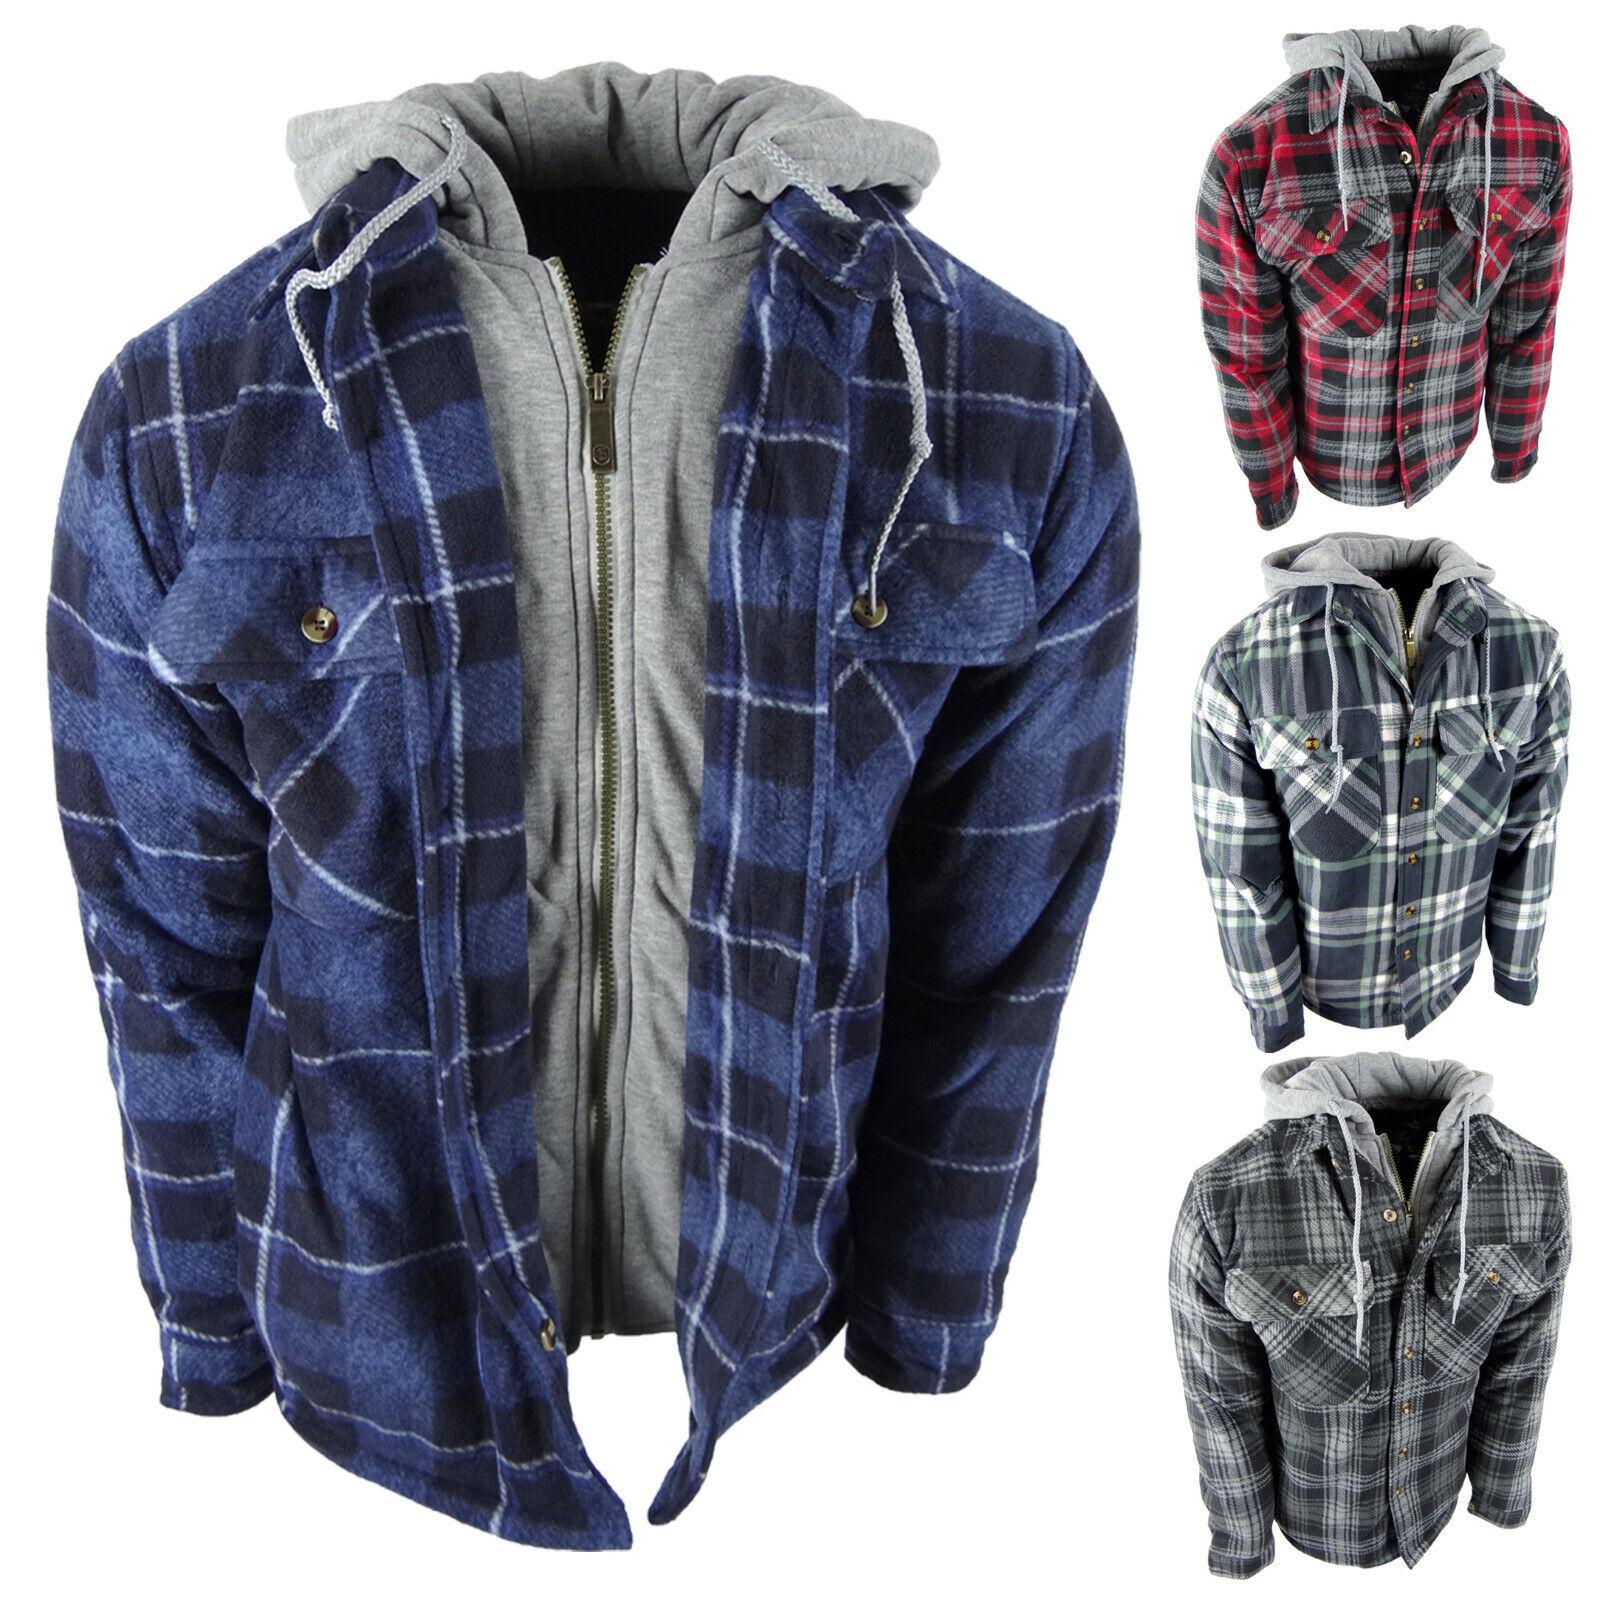 Mens Plaid Flannel Shirt Hoodie Soft Fuzzy Fleece Sherpa Lined Zip-Up 4 Pocket